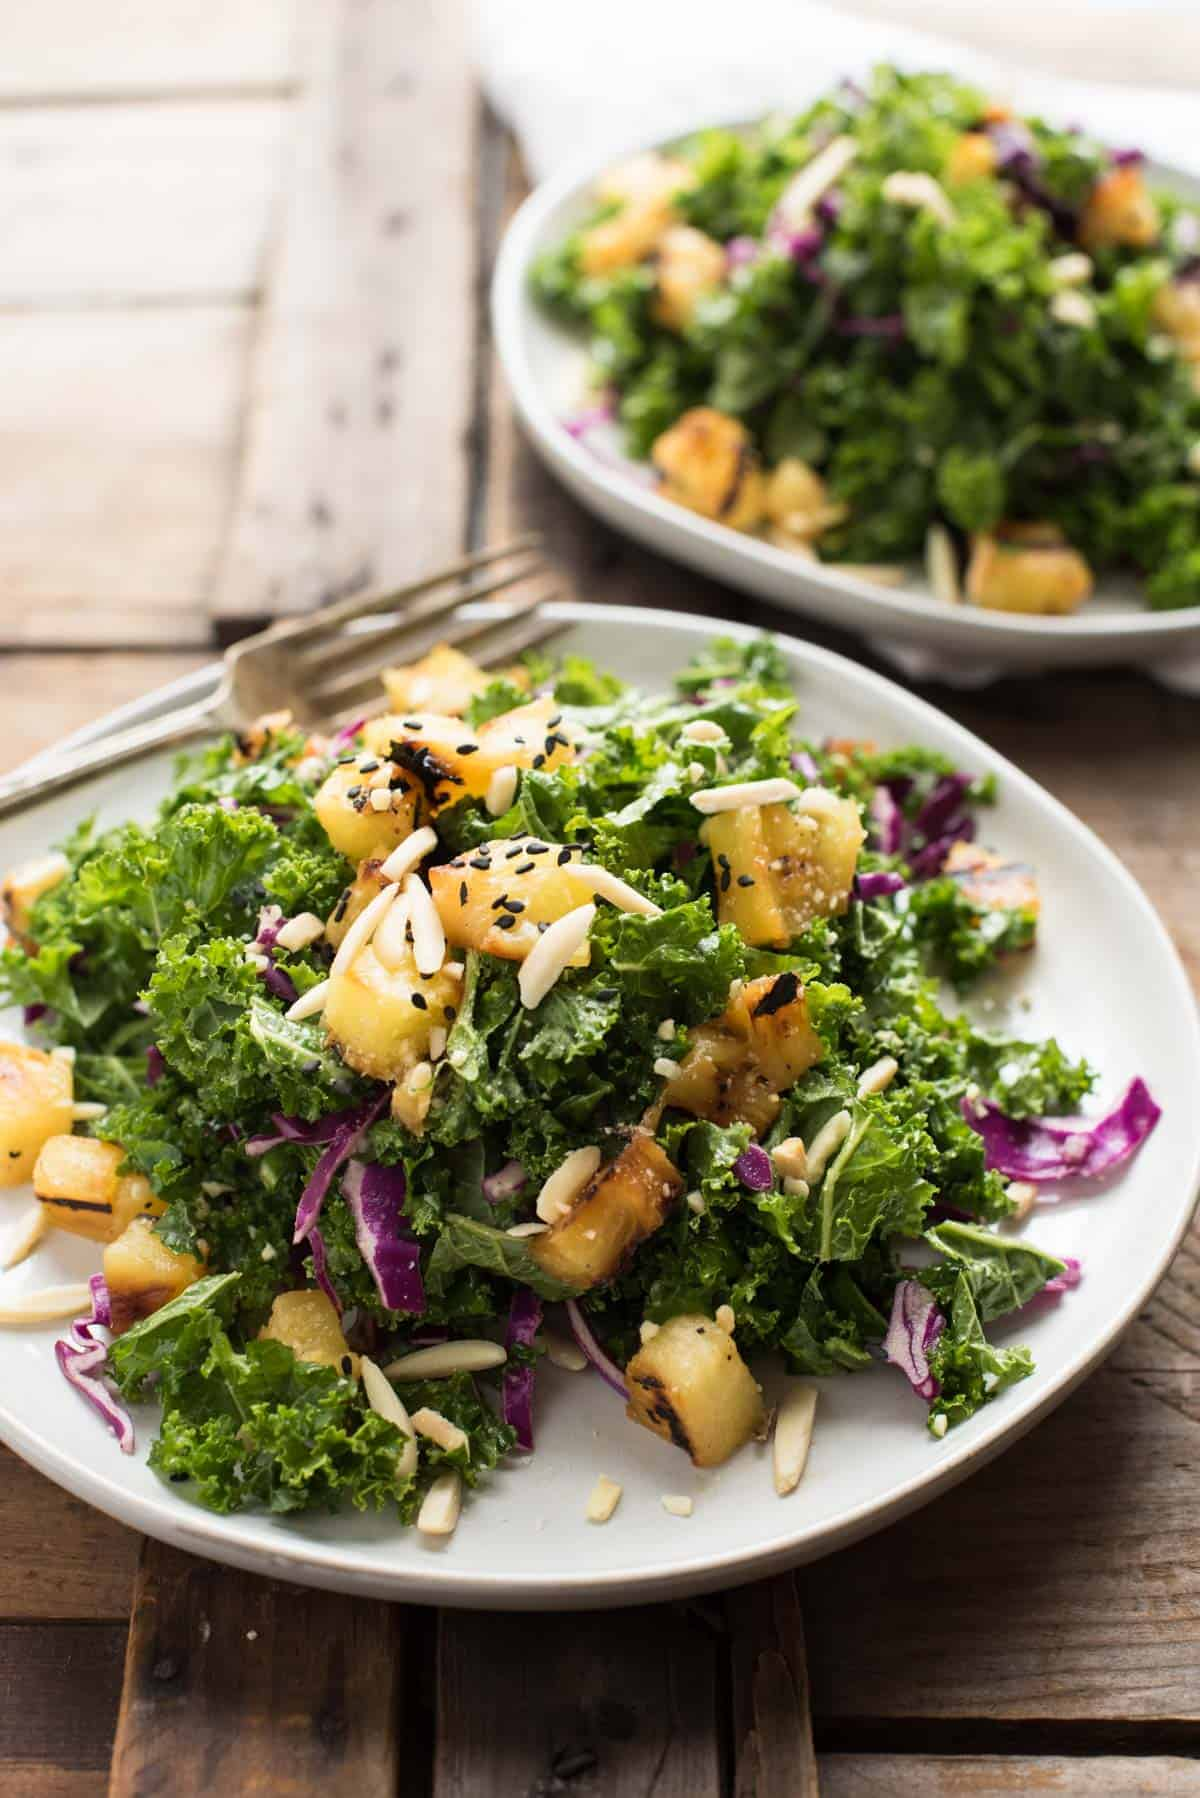 Grilled Pineapple Kale Salad